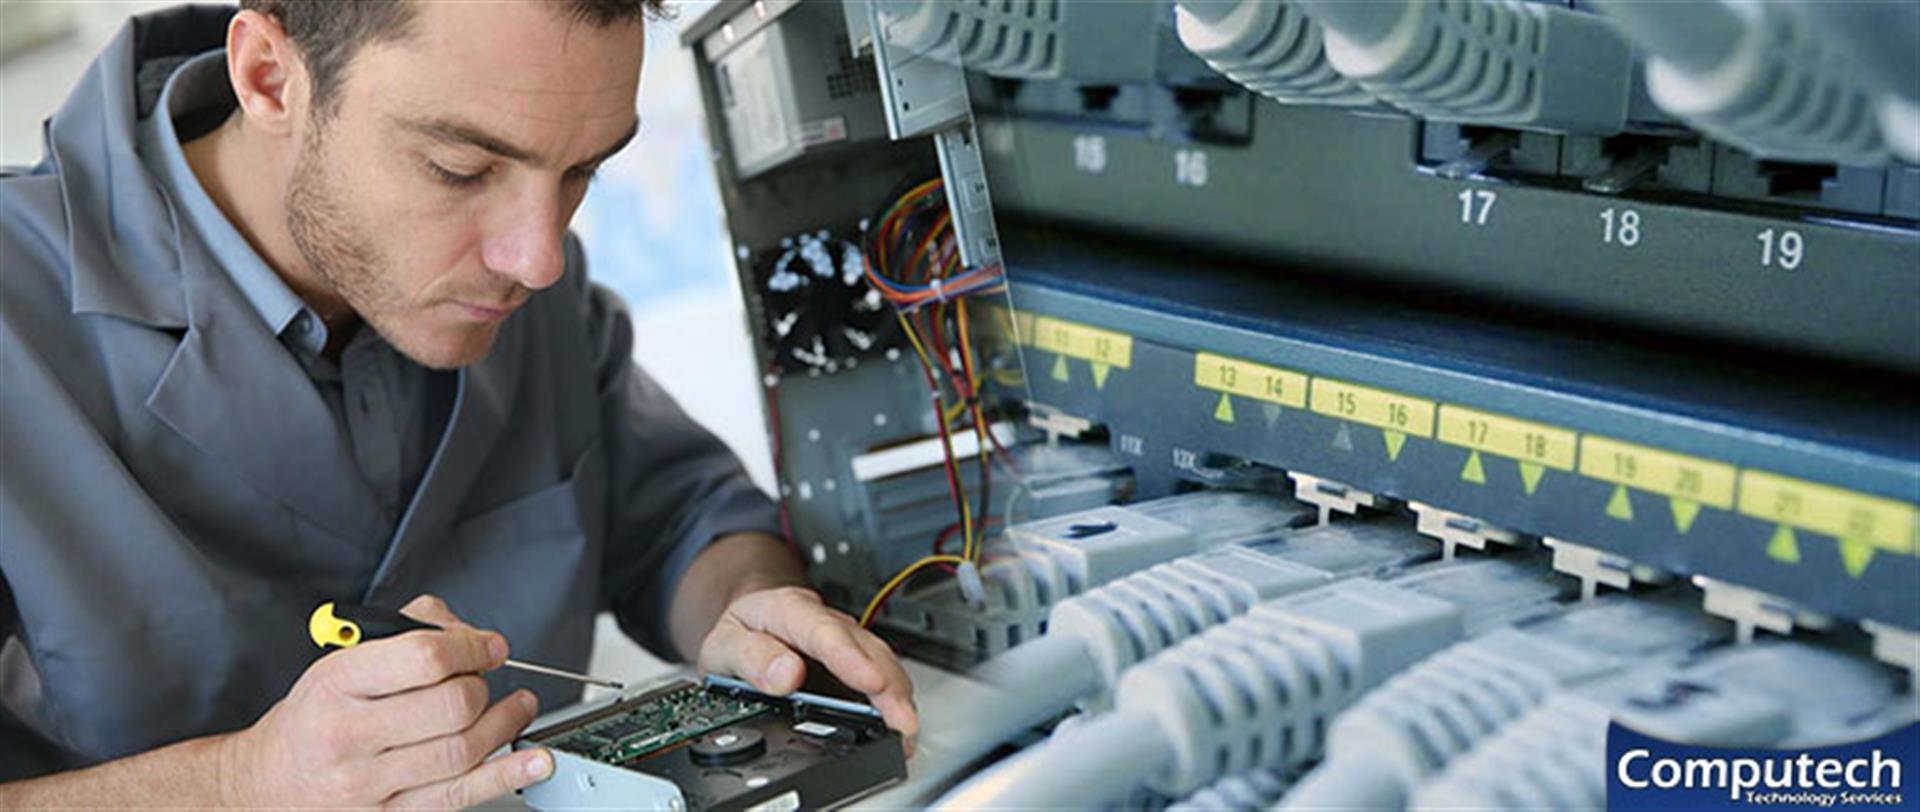 Murfreesboro Tennessee Onsite Computer & Printer Repair, Networking, Voice & Data Cabling Solutions